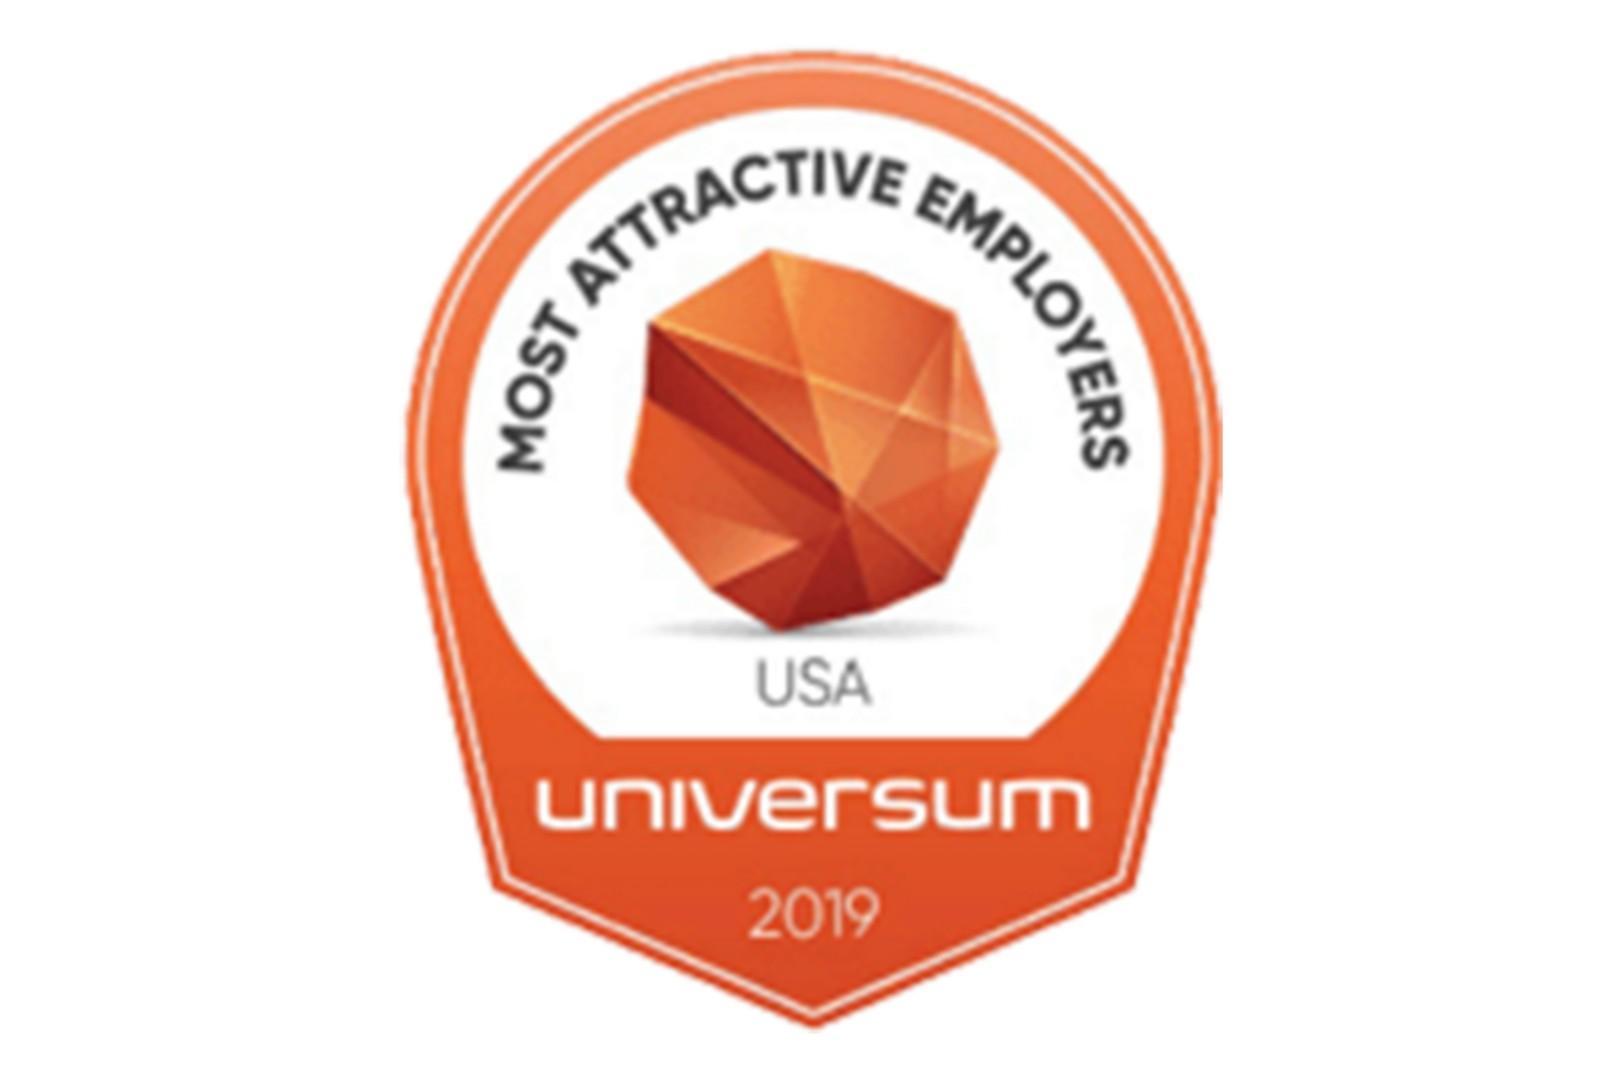 Universum USA's Most Attractive Employers 2019